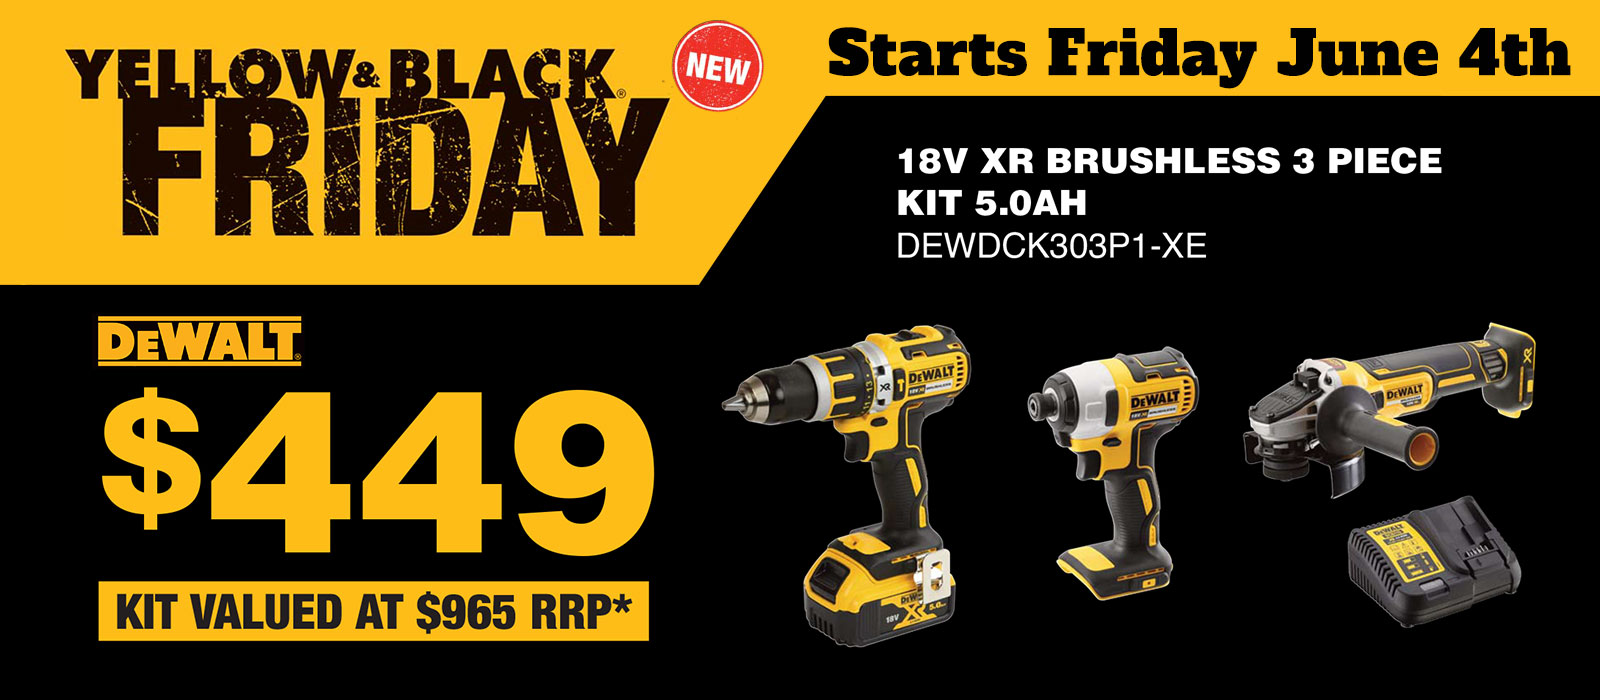 Yellow & Black Friday DEWDCK303P1-XE